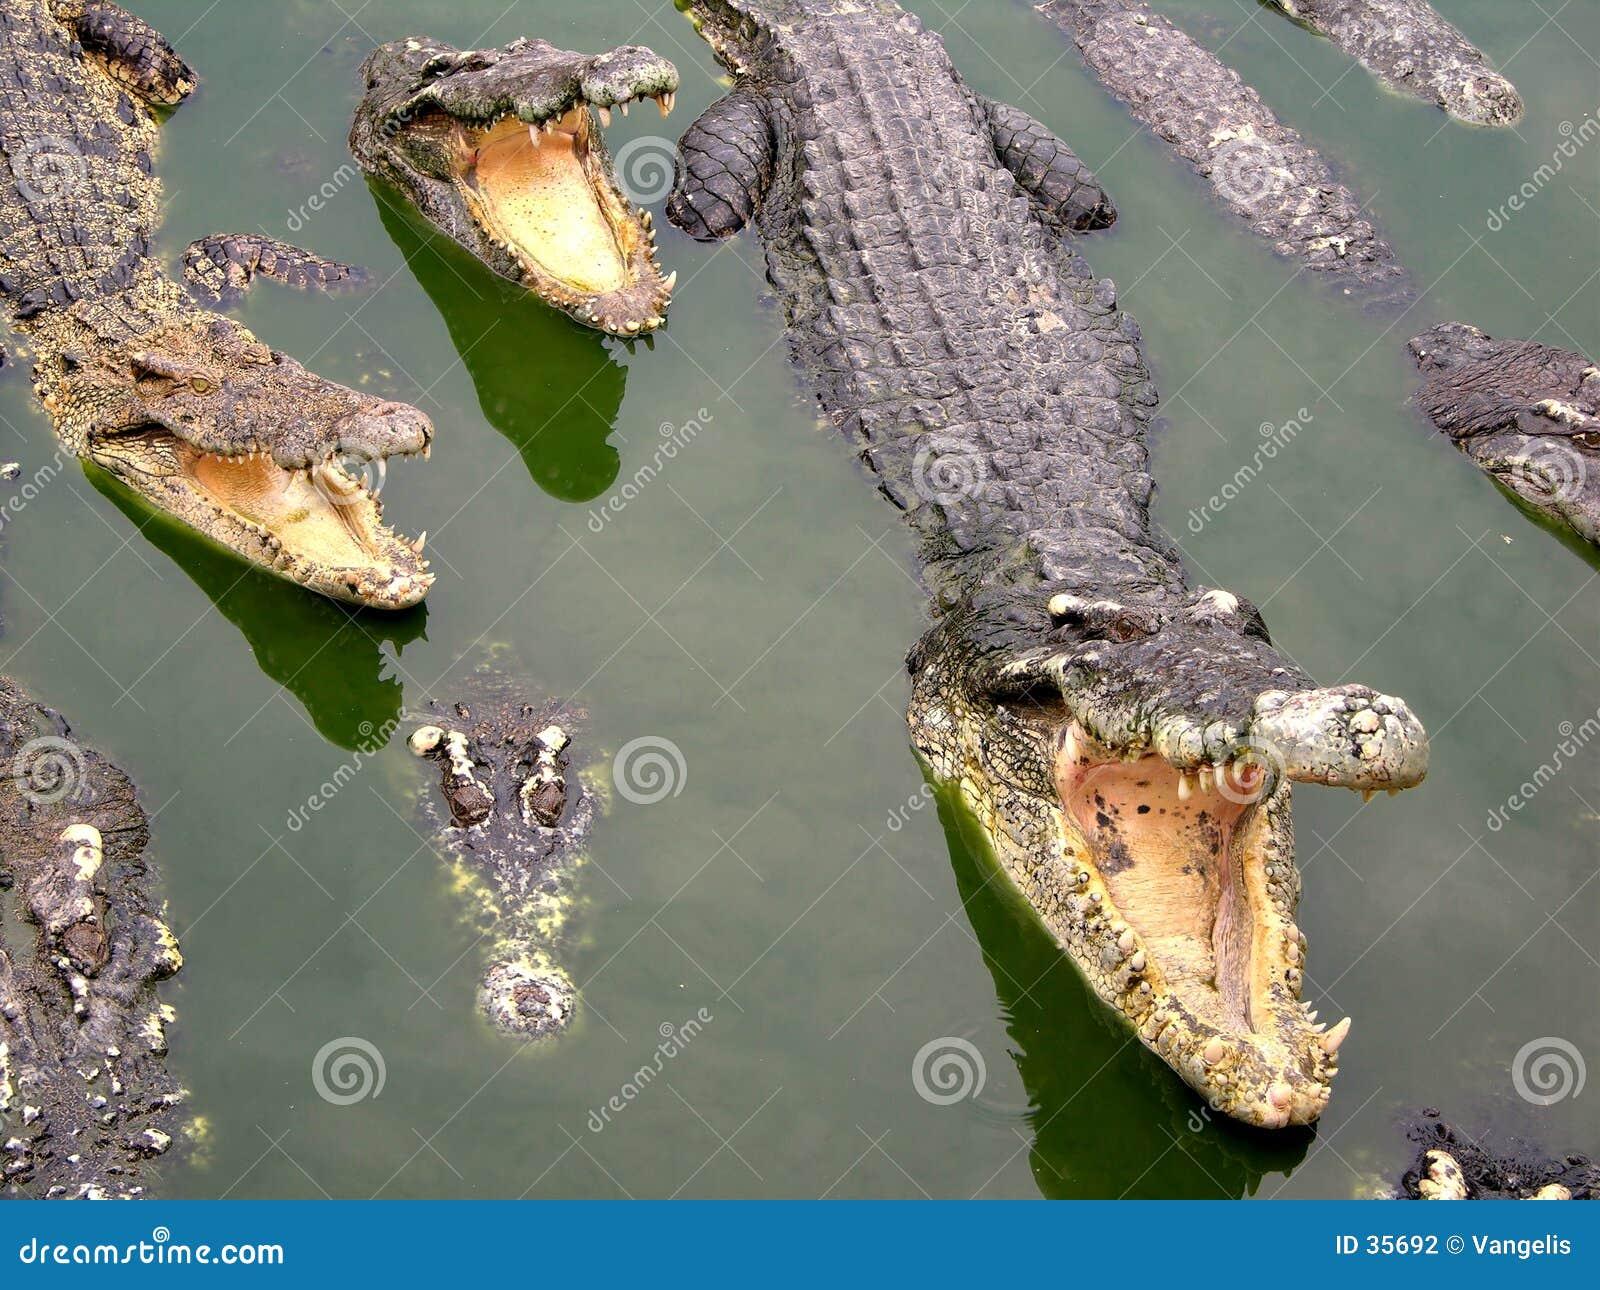 Samutprakan Krokodil-Bauernhof und Zoo